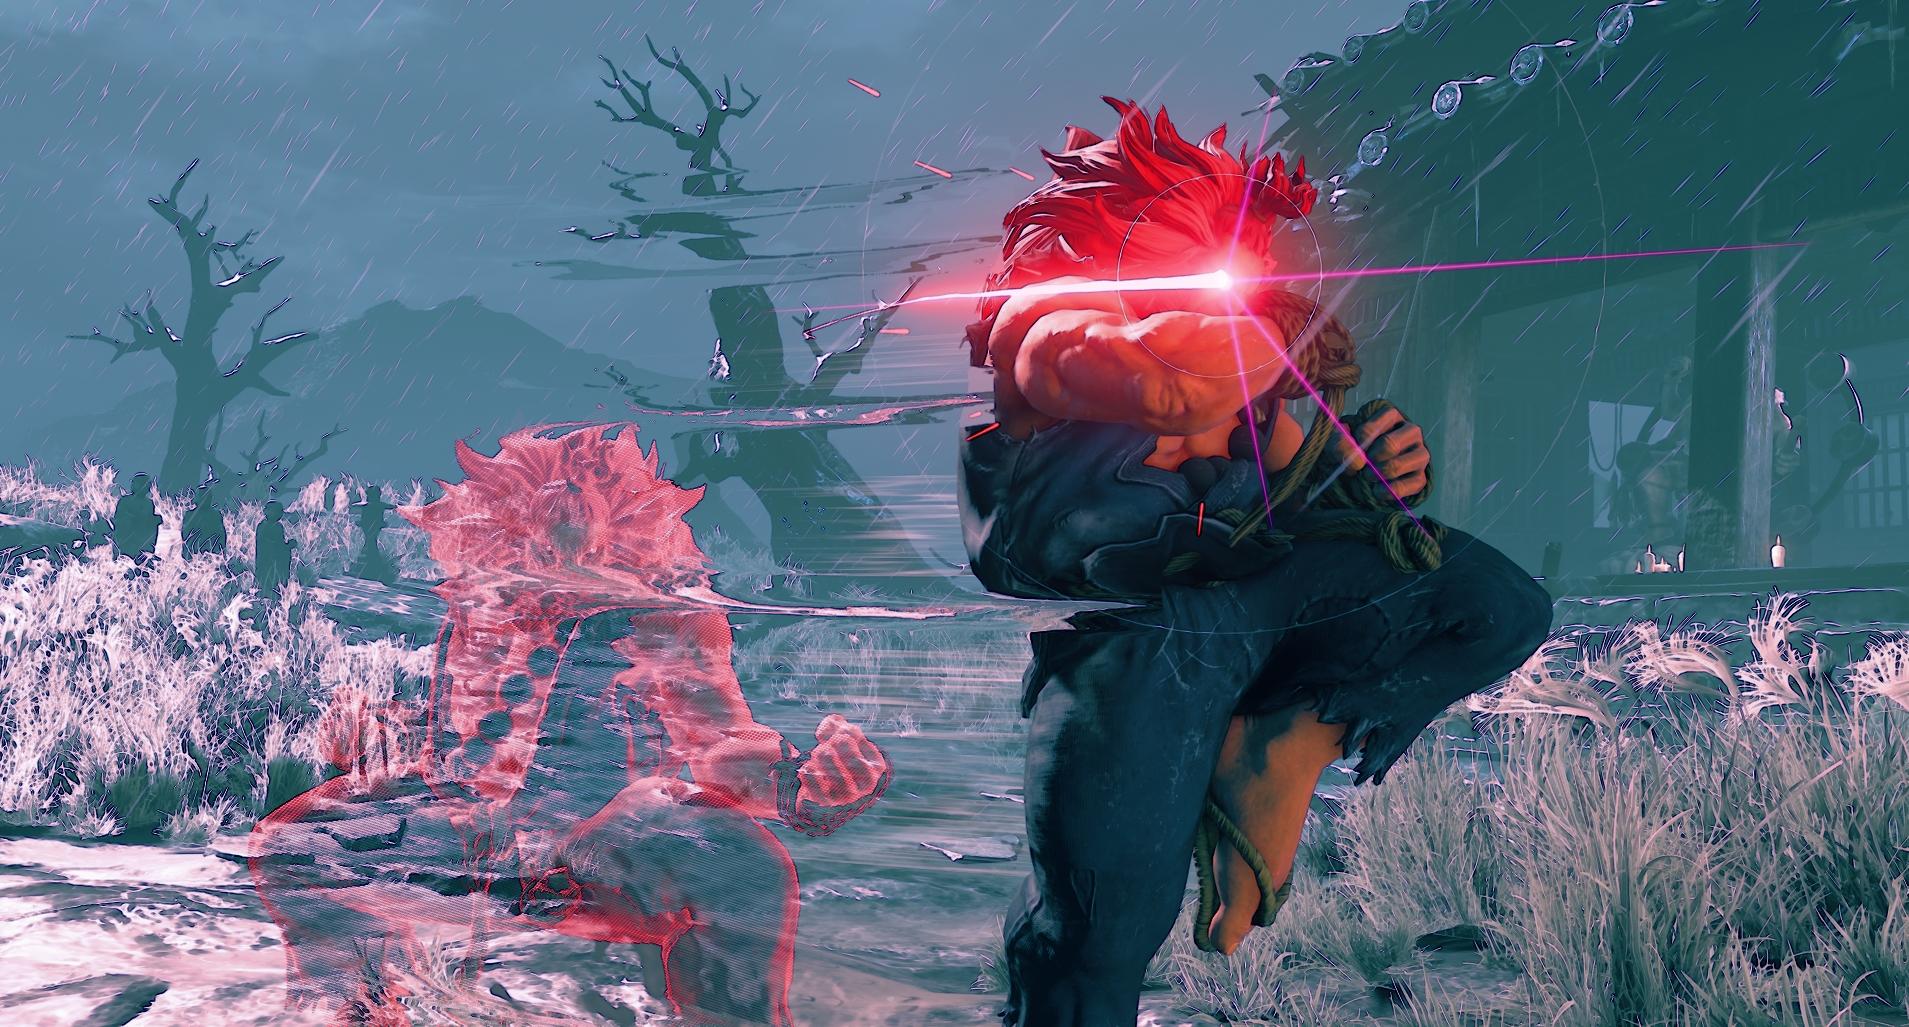 Street Fighter V New Patch Brings Massive Balance Tweaks